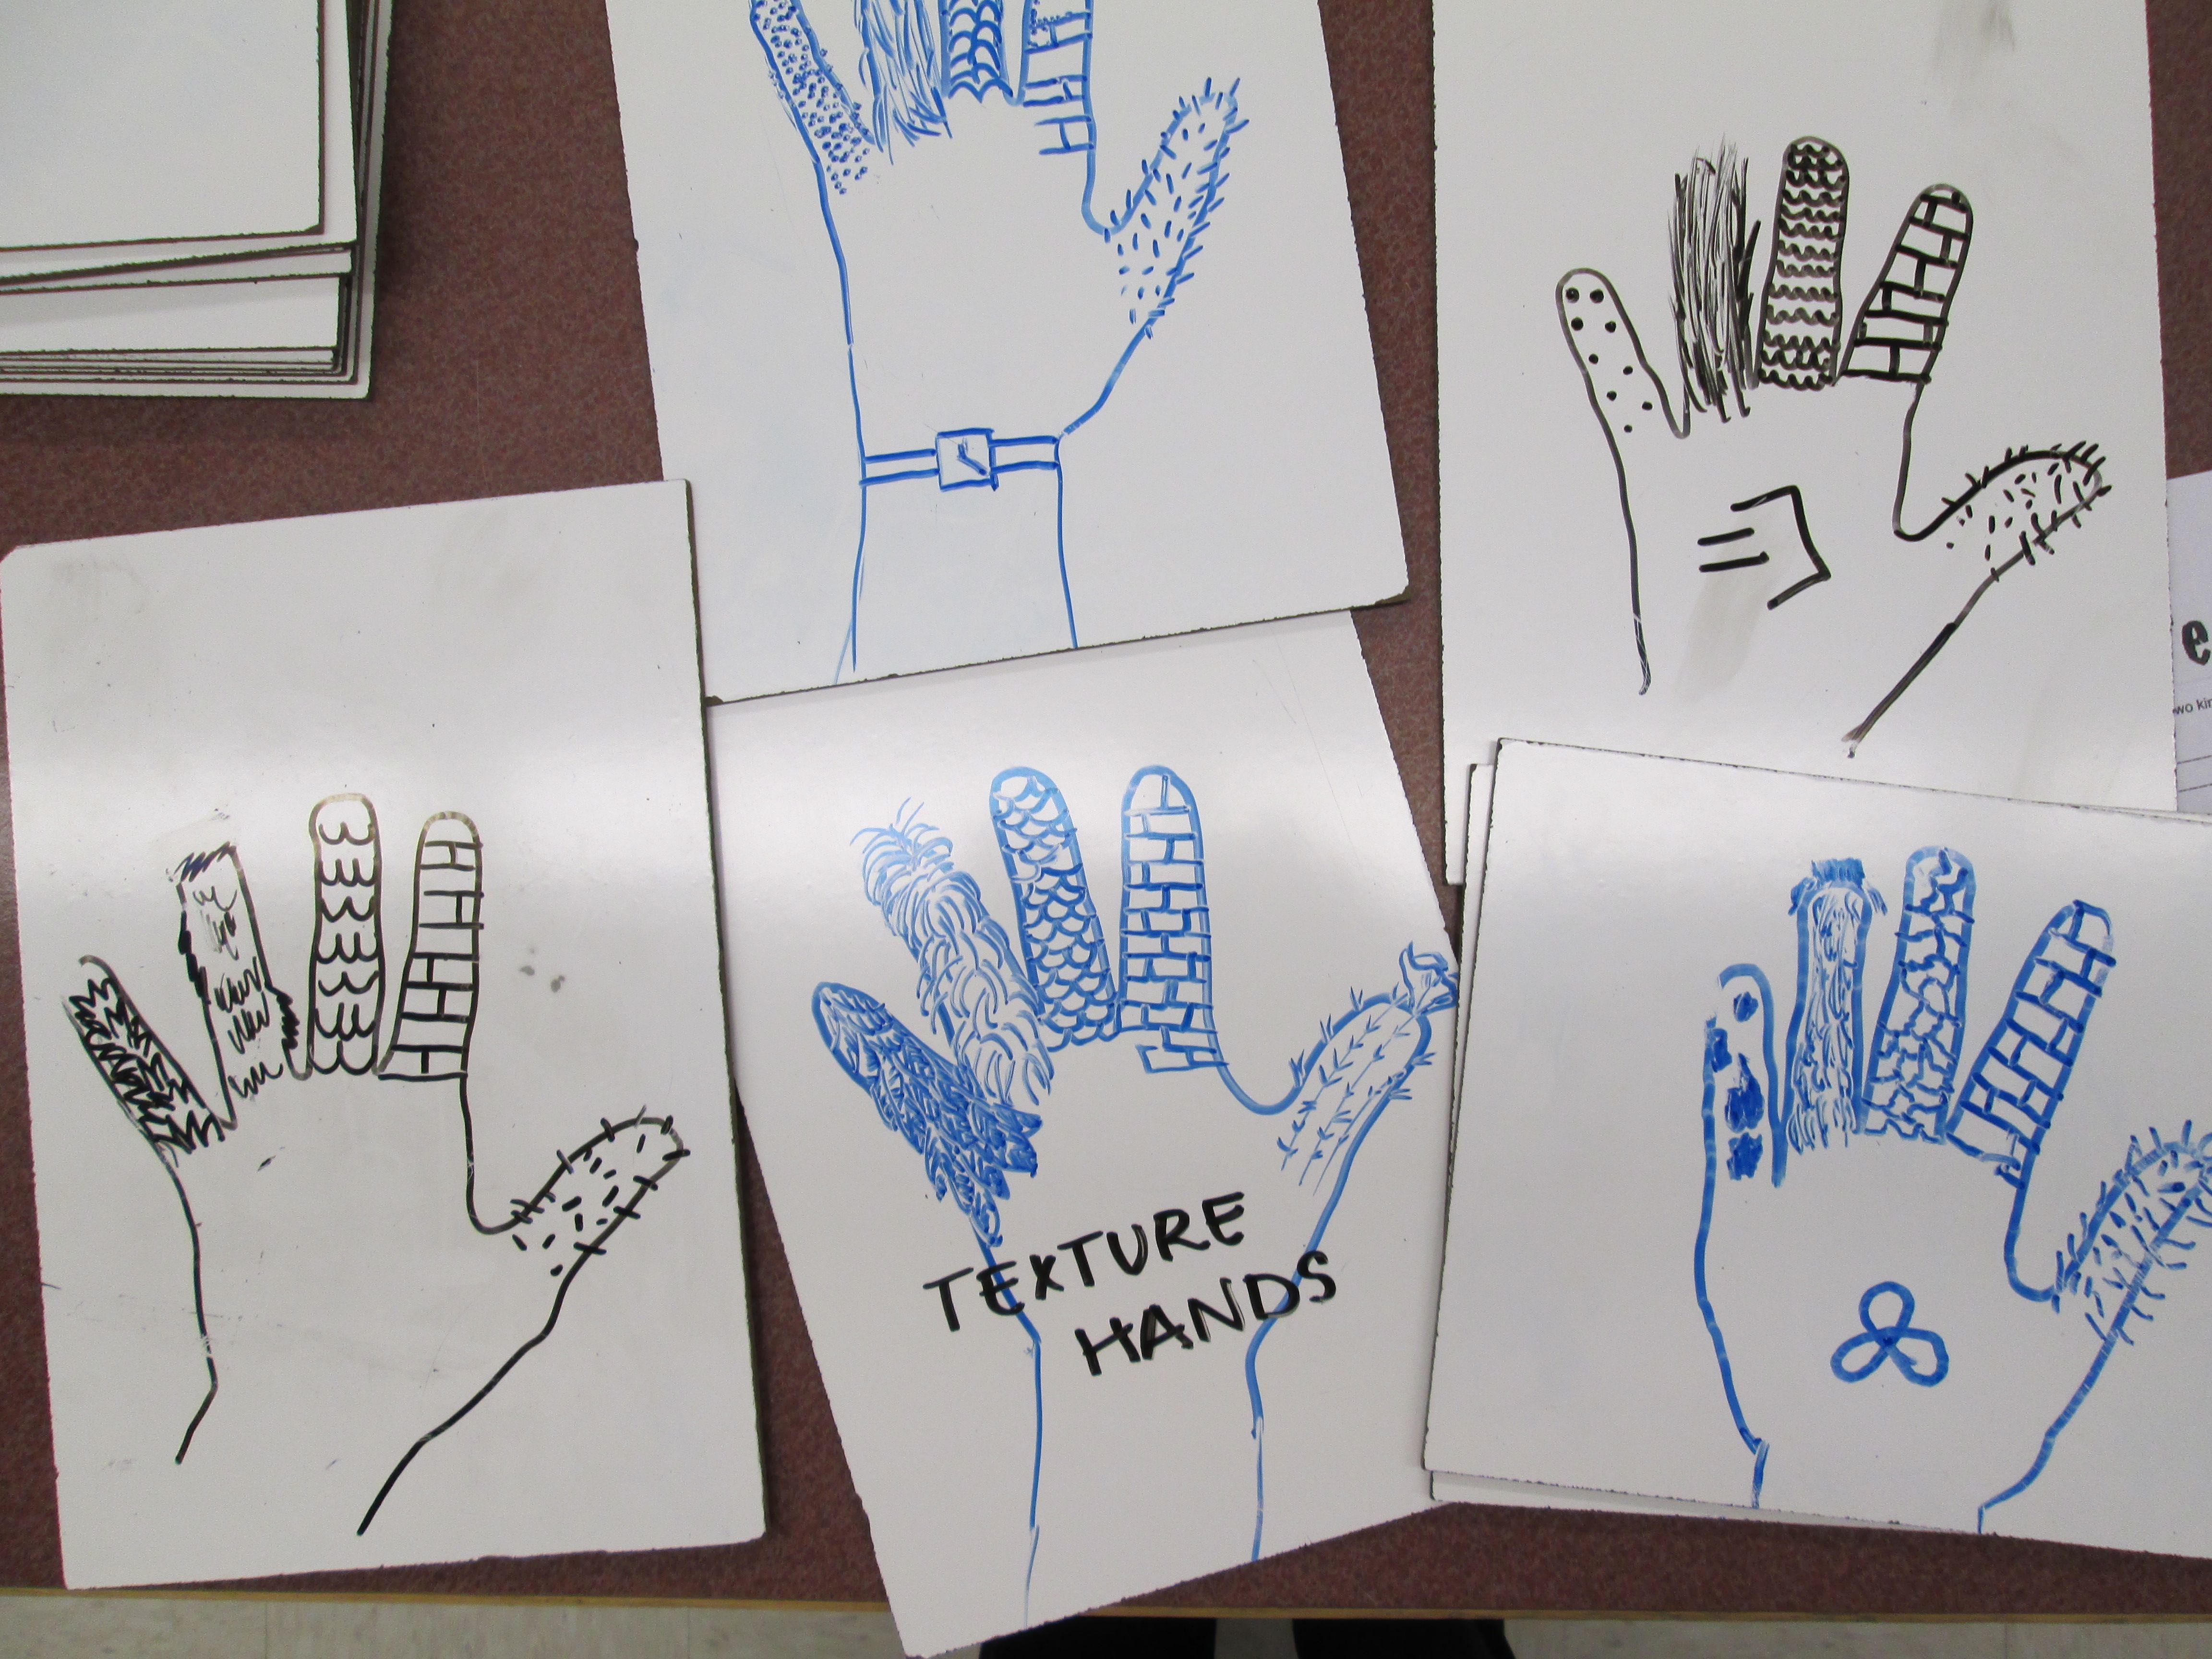 Texture Hands Activity On Eraser Boards